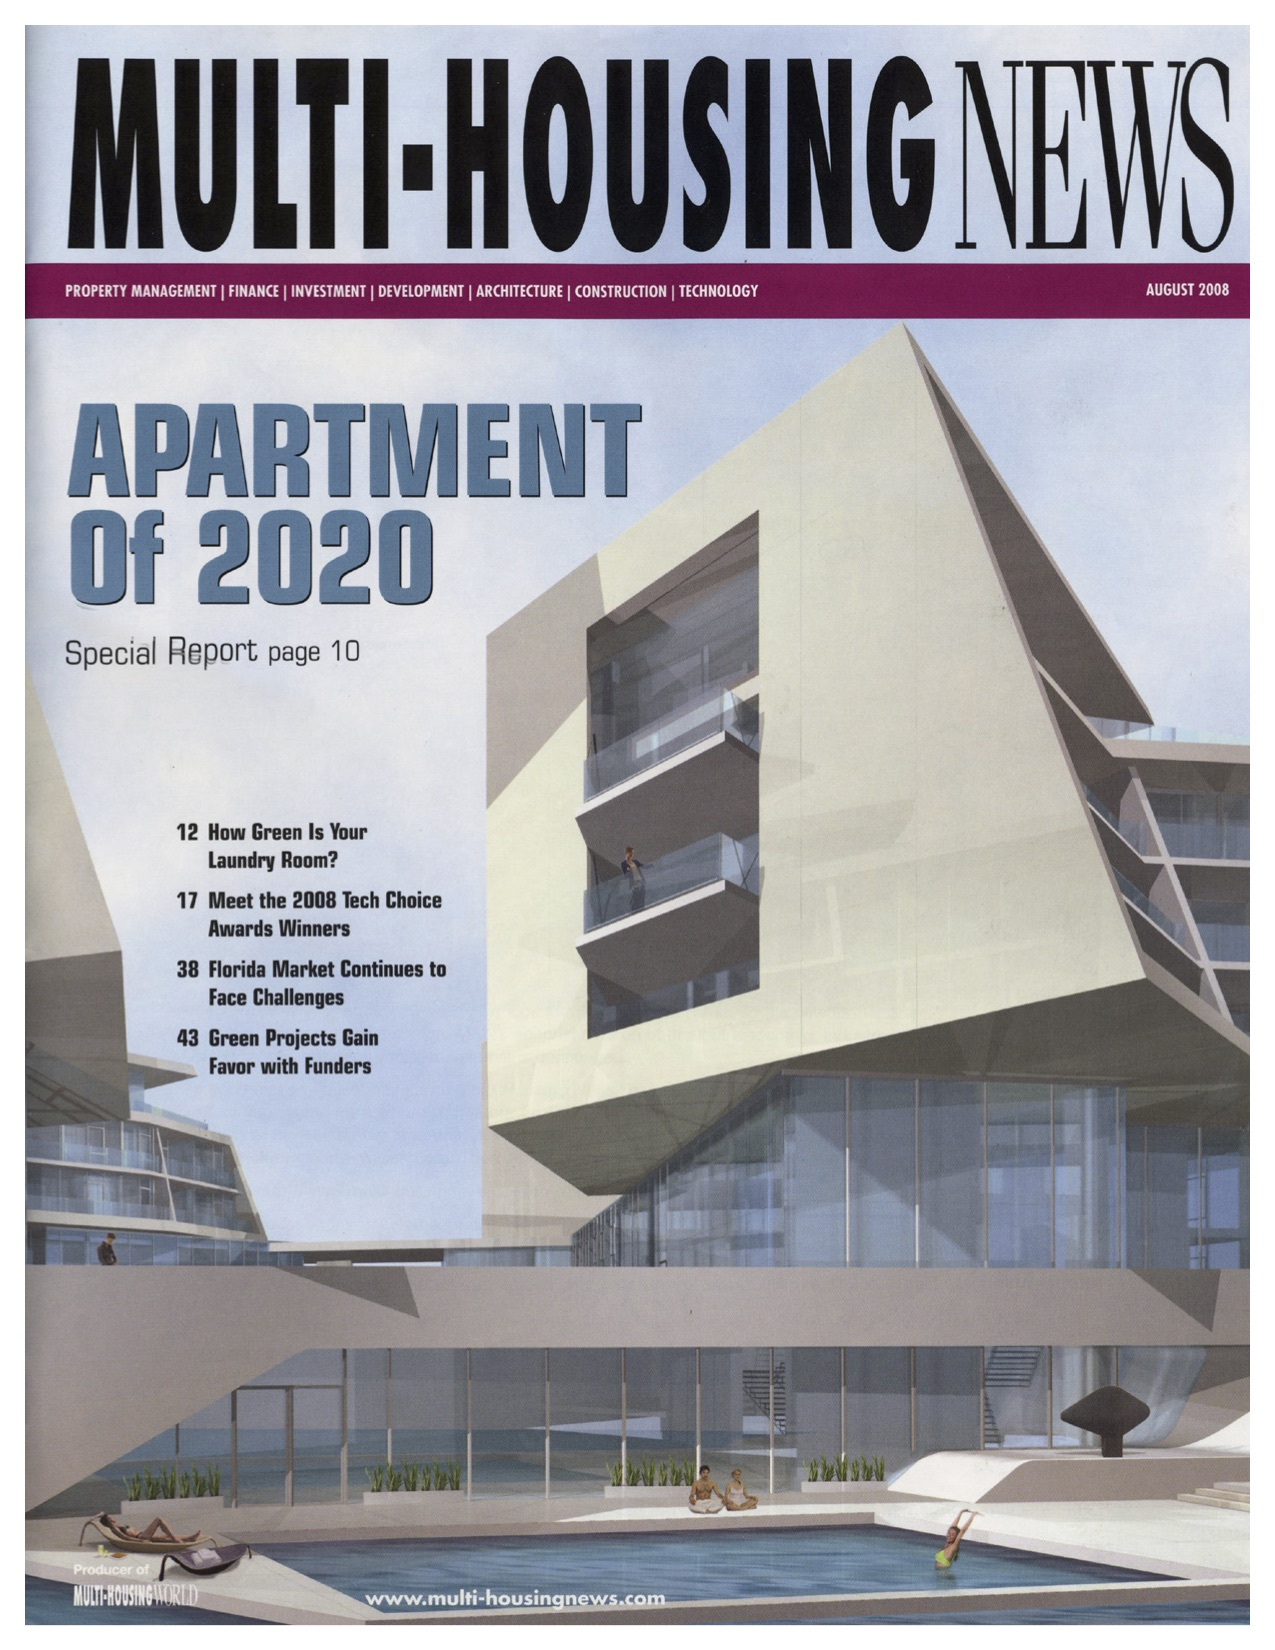 08.08 MULTI-HOUSING NEWS (SALZBURG)